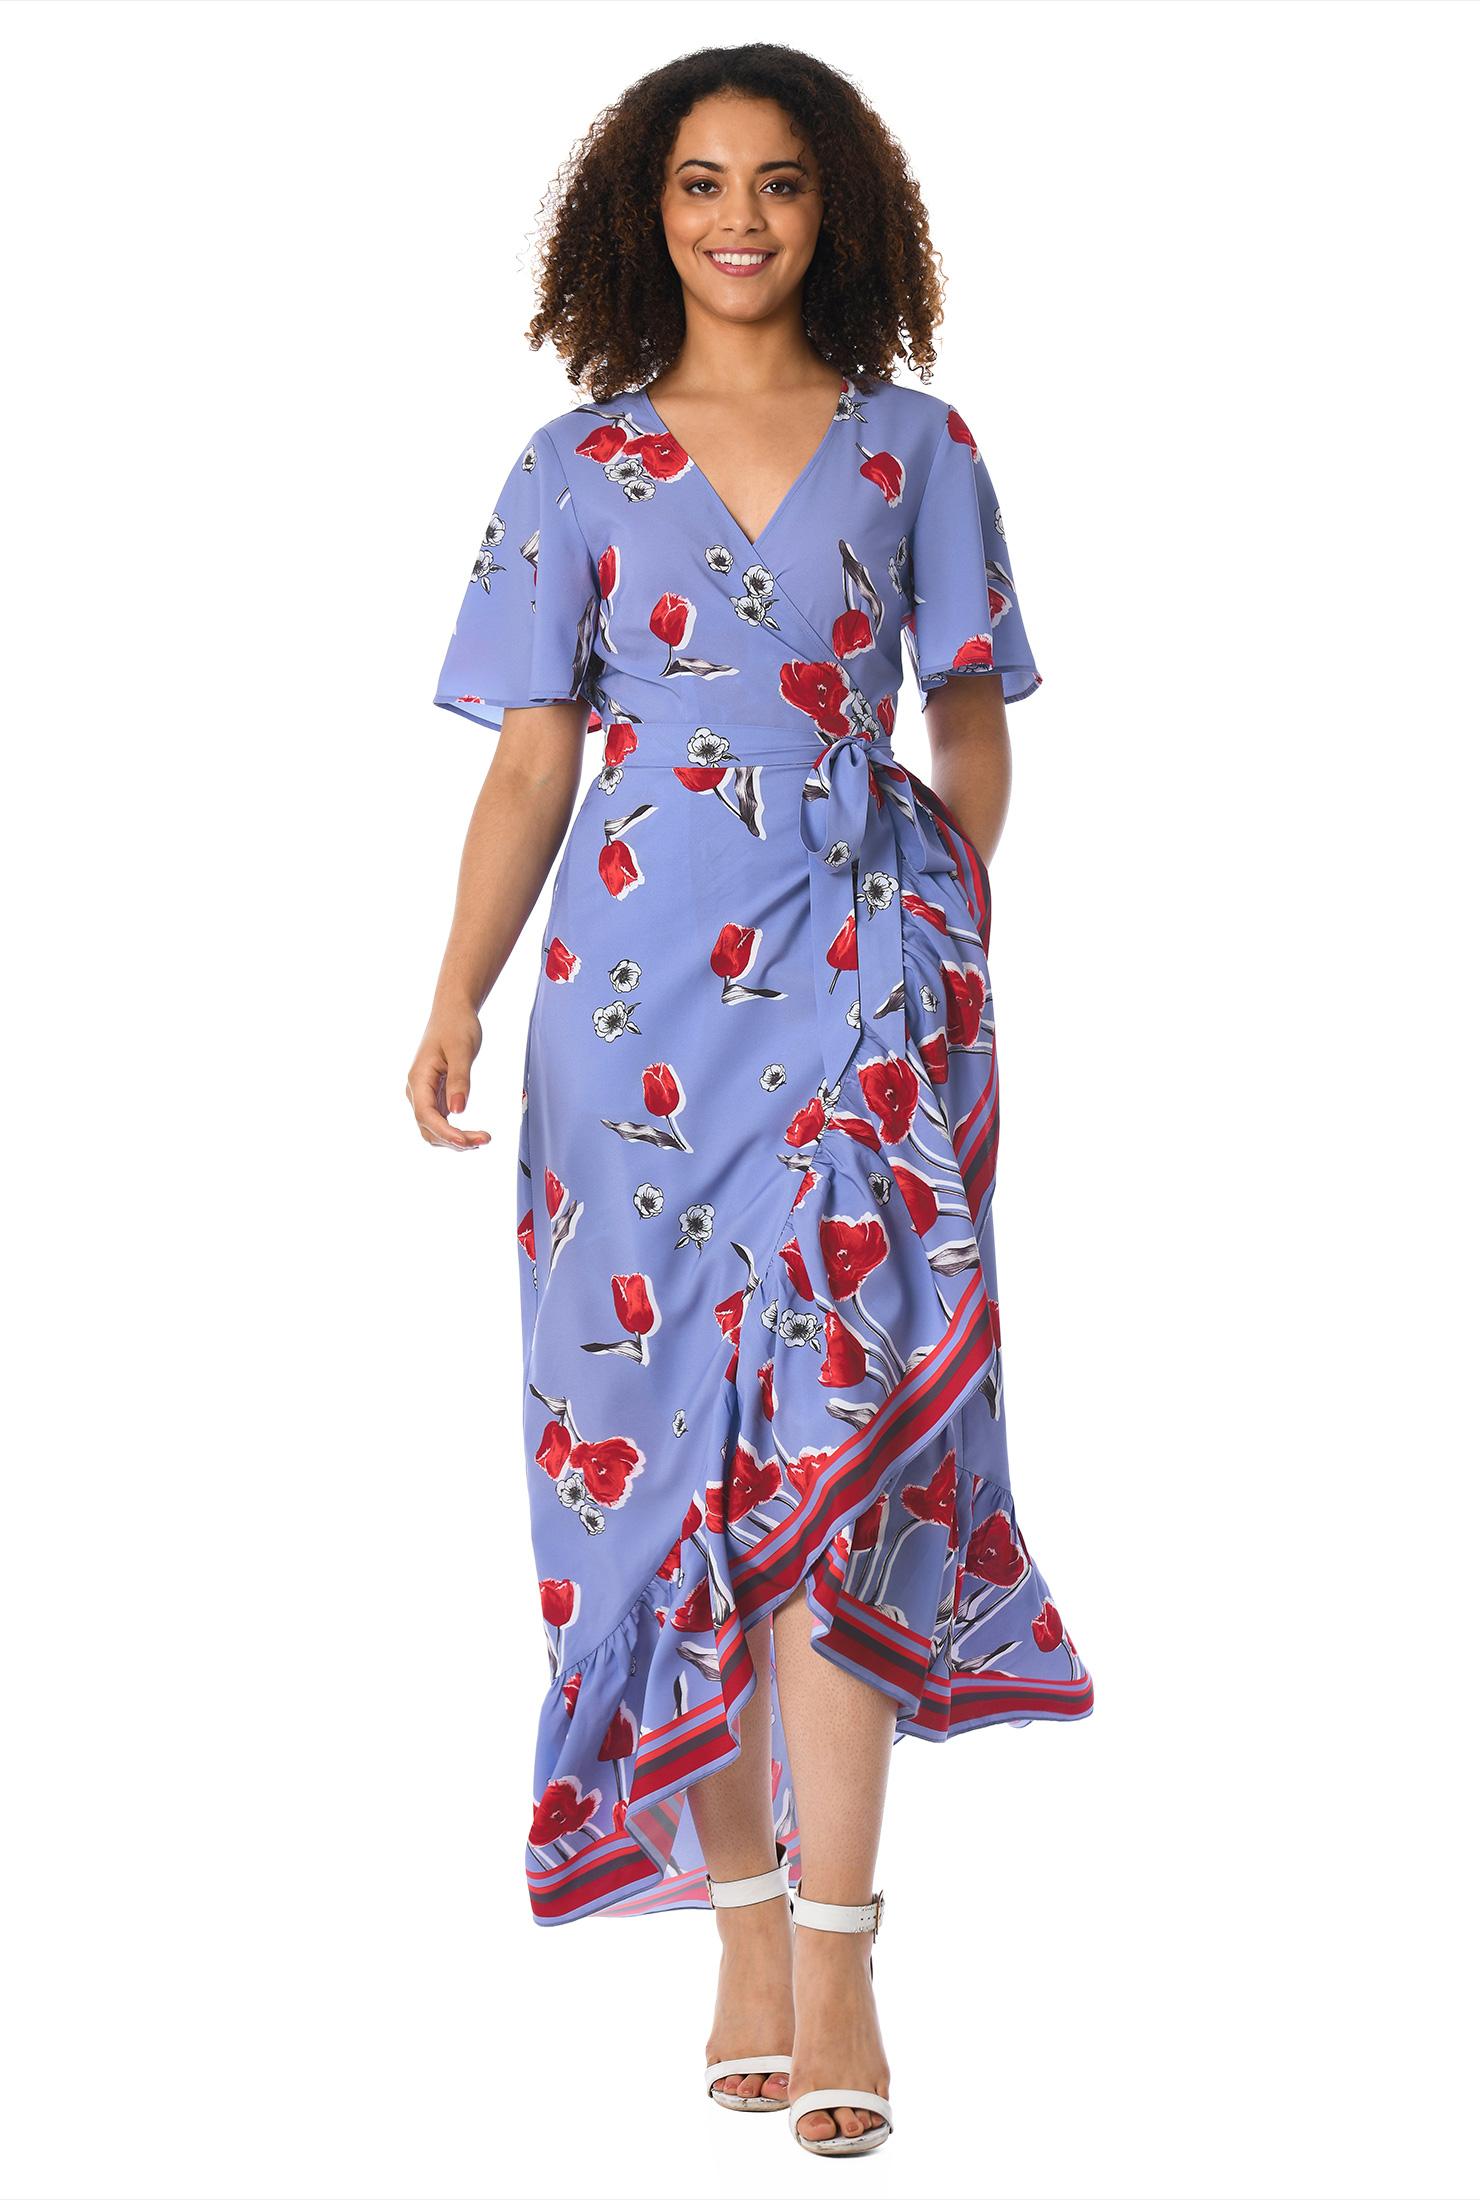 cdc18bc6e7cbf Women's Fashion Clothing 0-36W and Custom